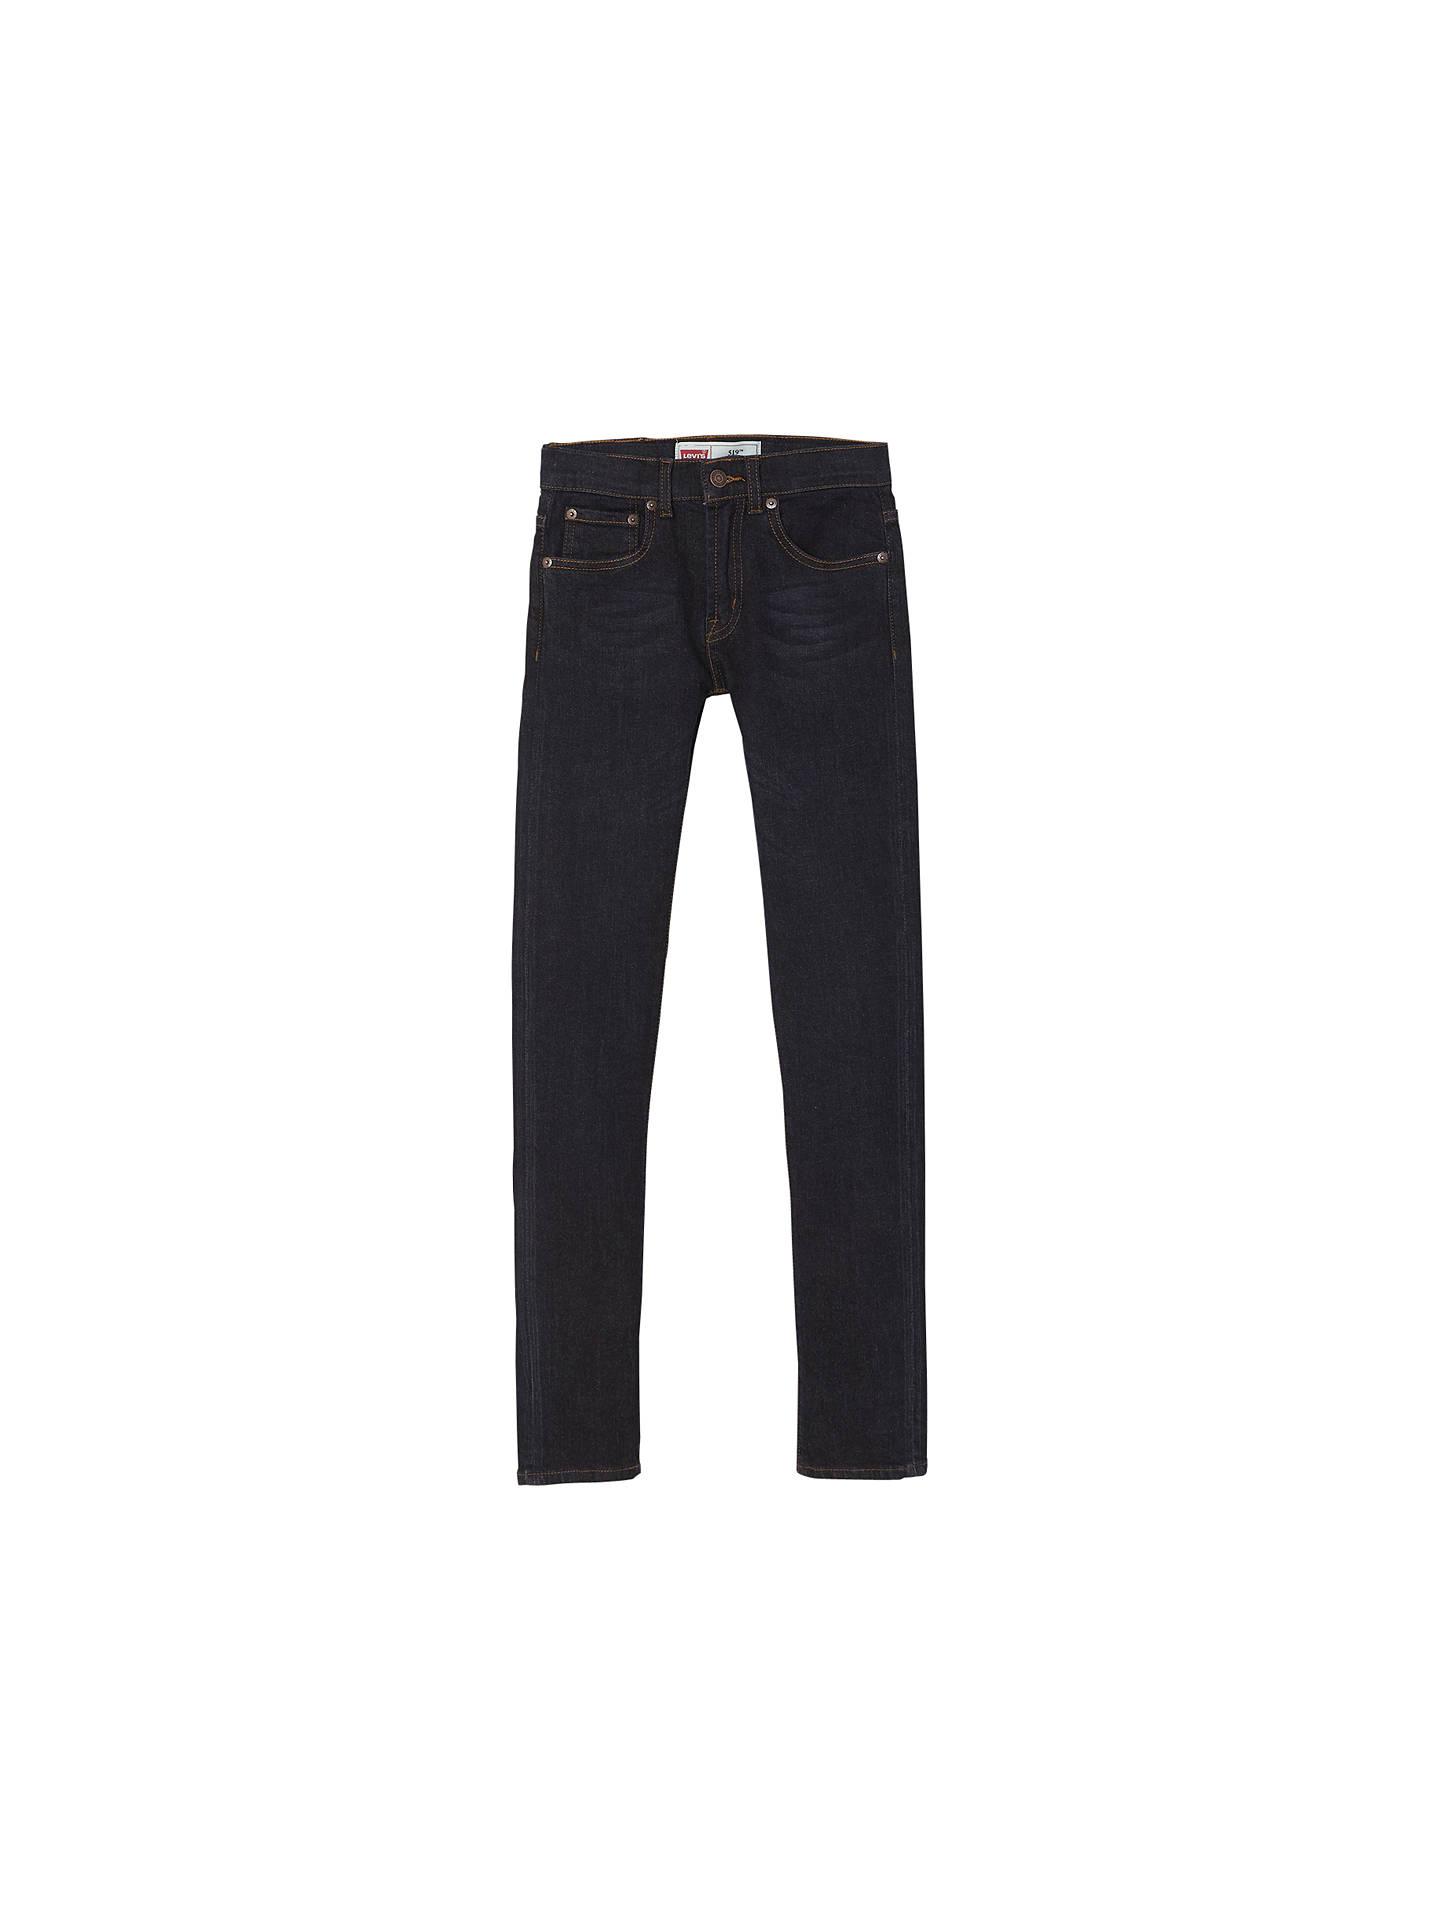 606bbbaf4 Buy Levi's Boys' 519 Extreme Skinny Fit Jeans, Dark Wash Denim, 4 years ...